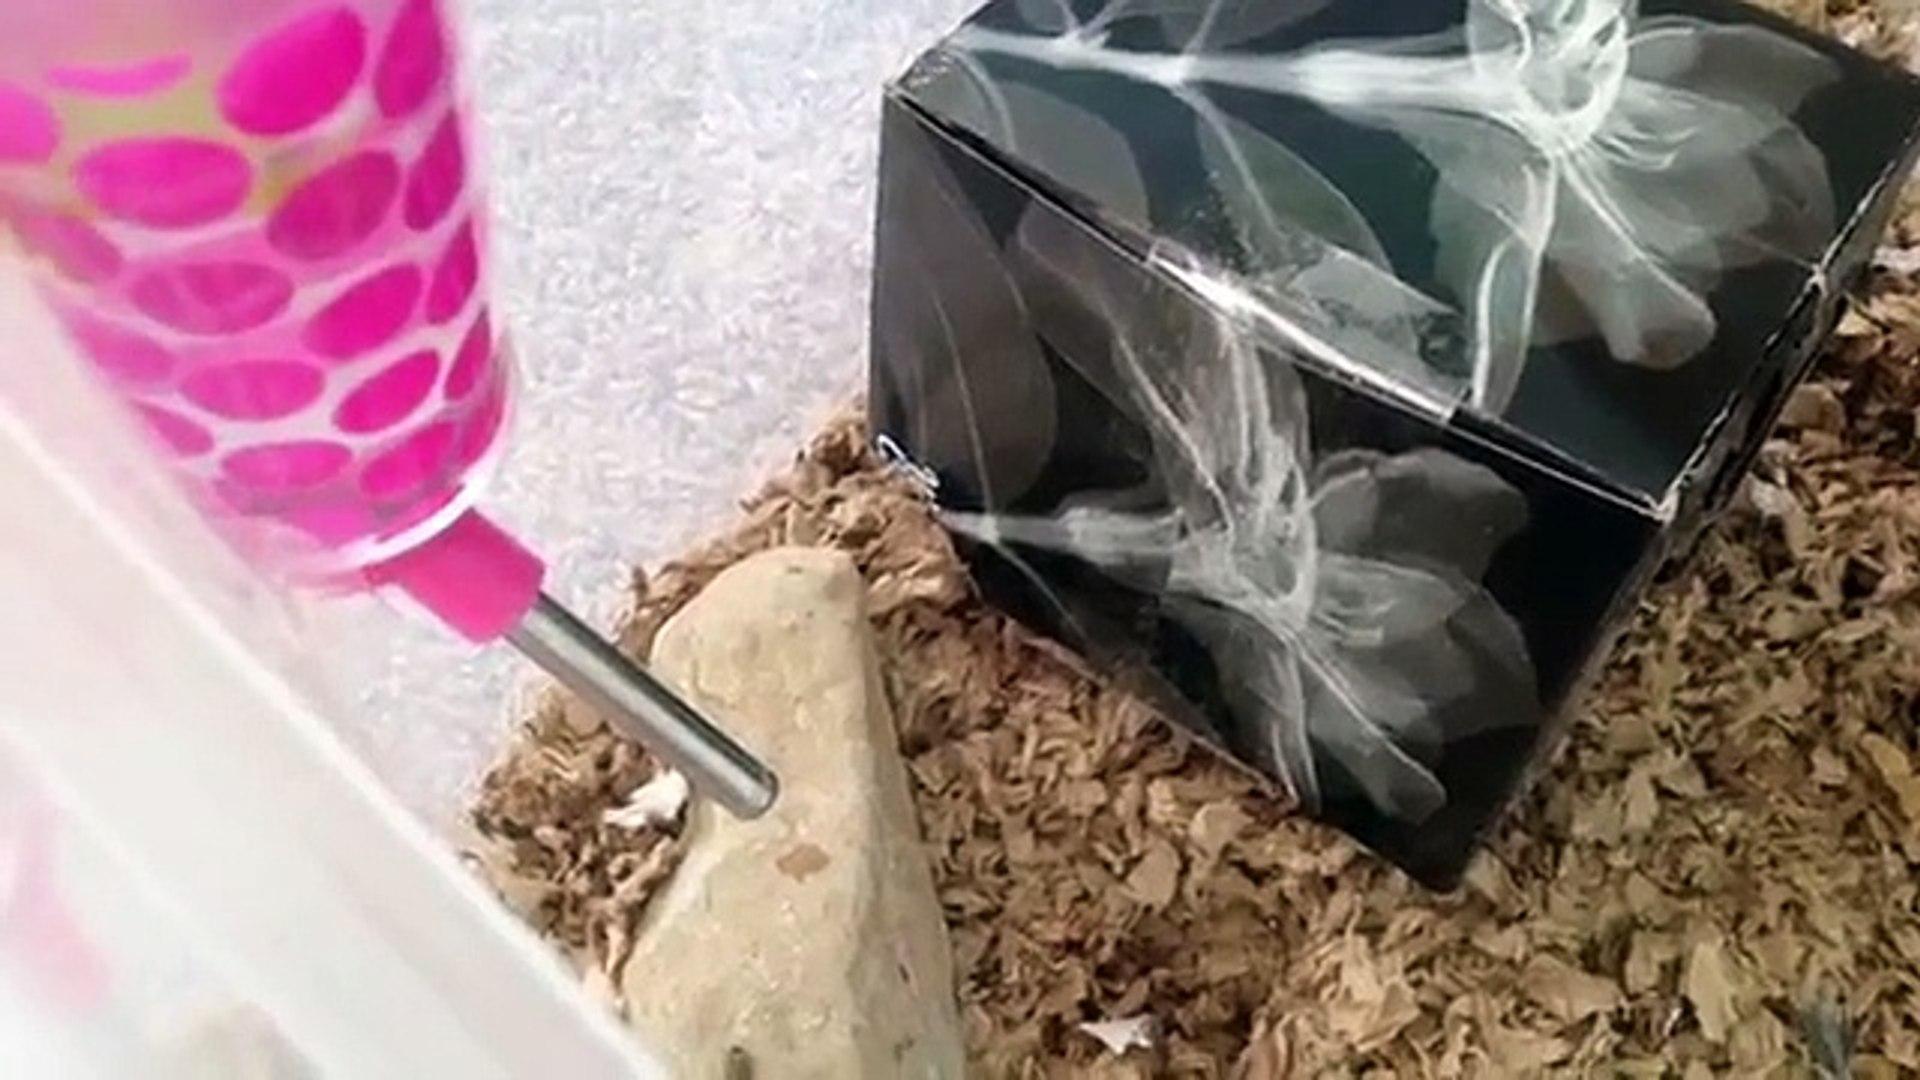 Hamster life hacks!